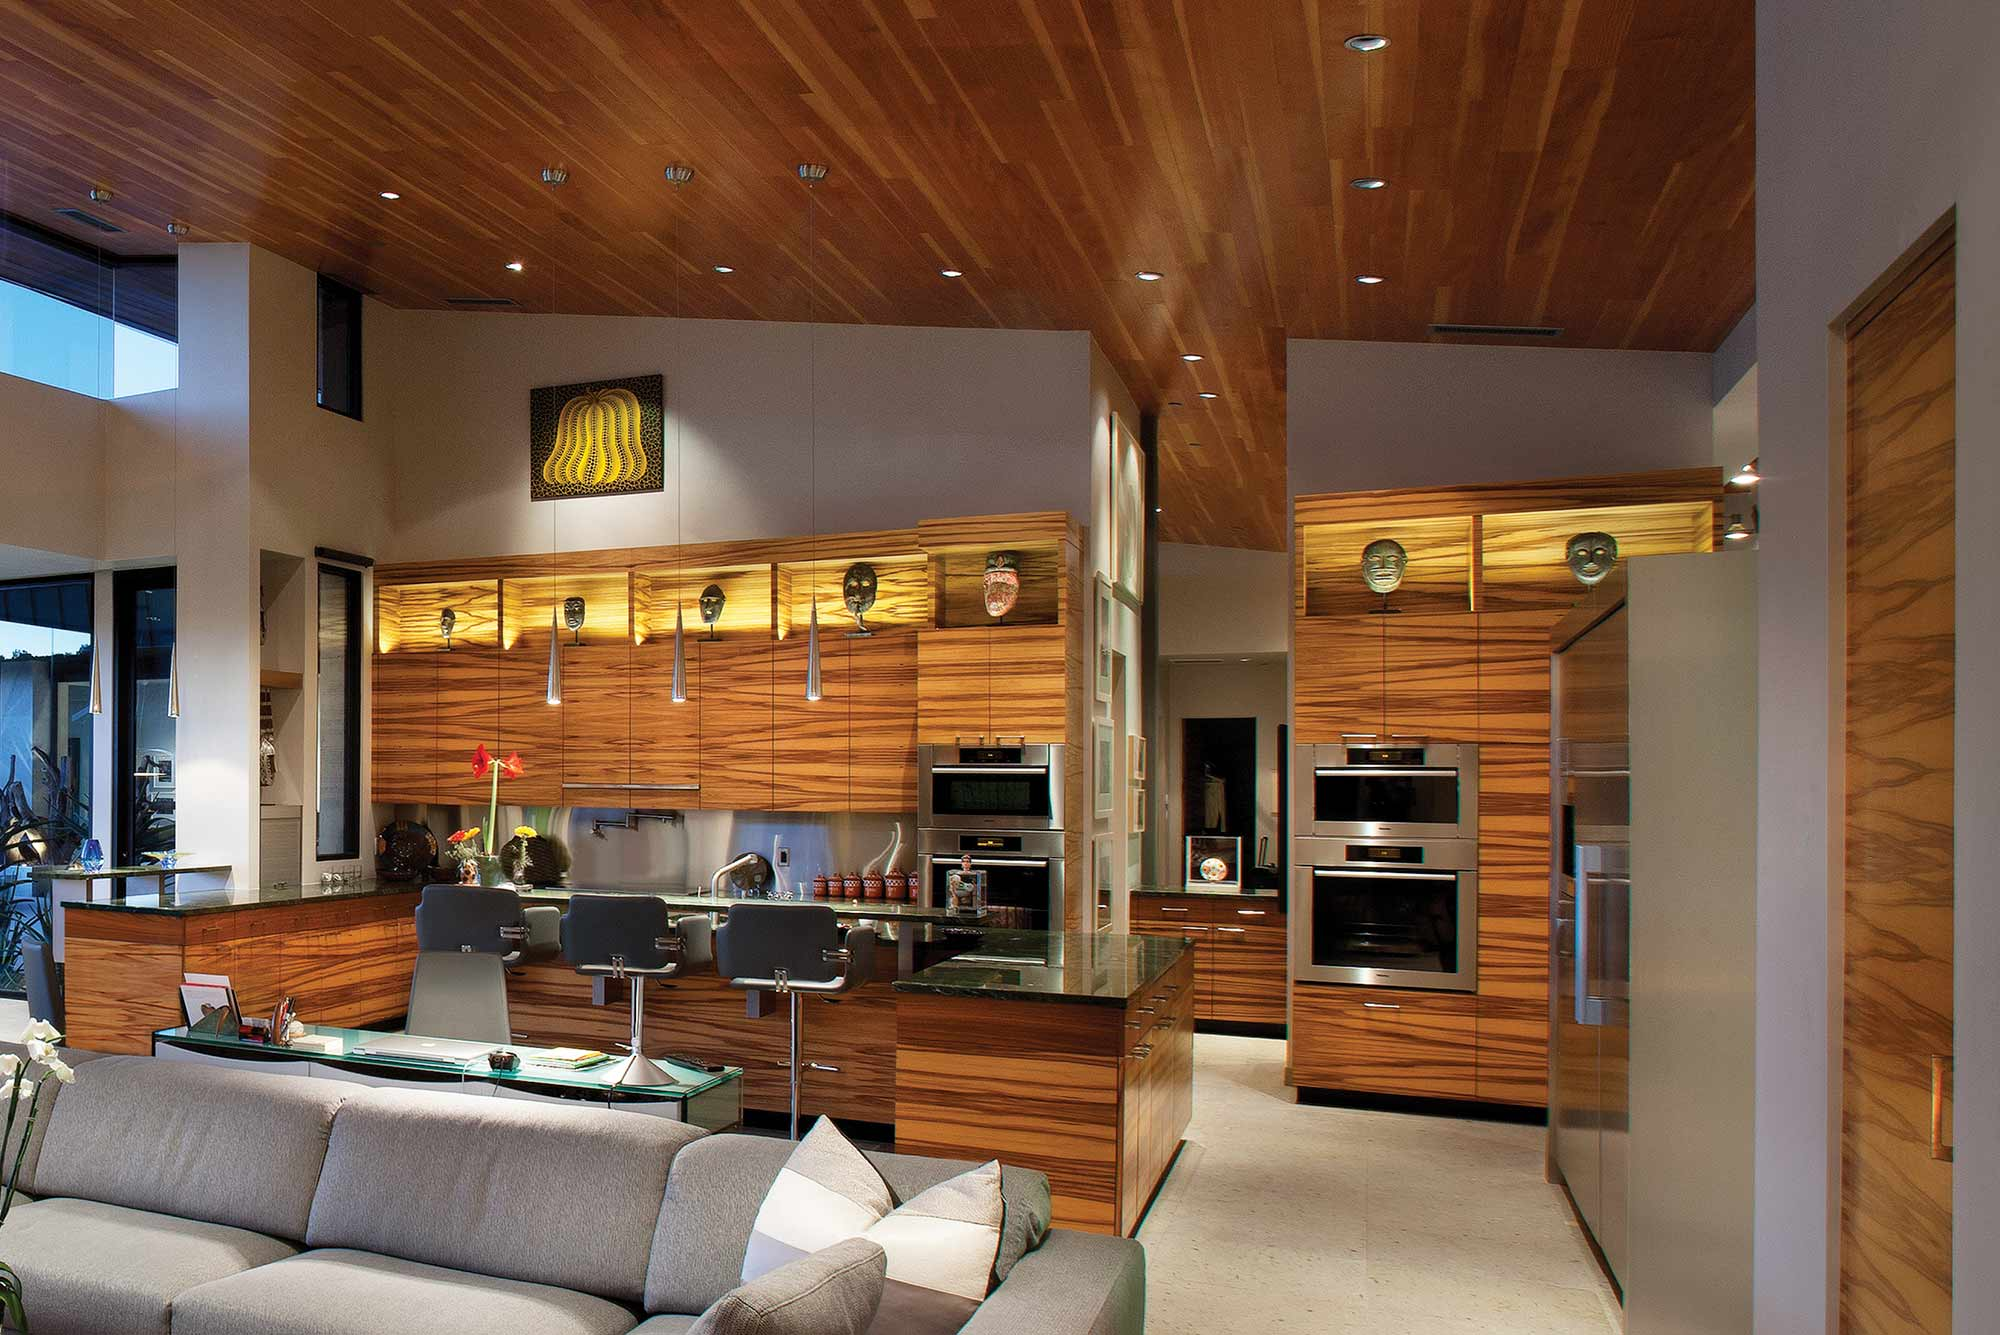 Linear Fine Woodworking  Custom Cabinetry  Millwork  Phoenix AZ